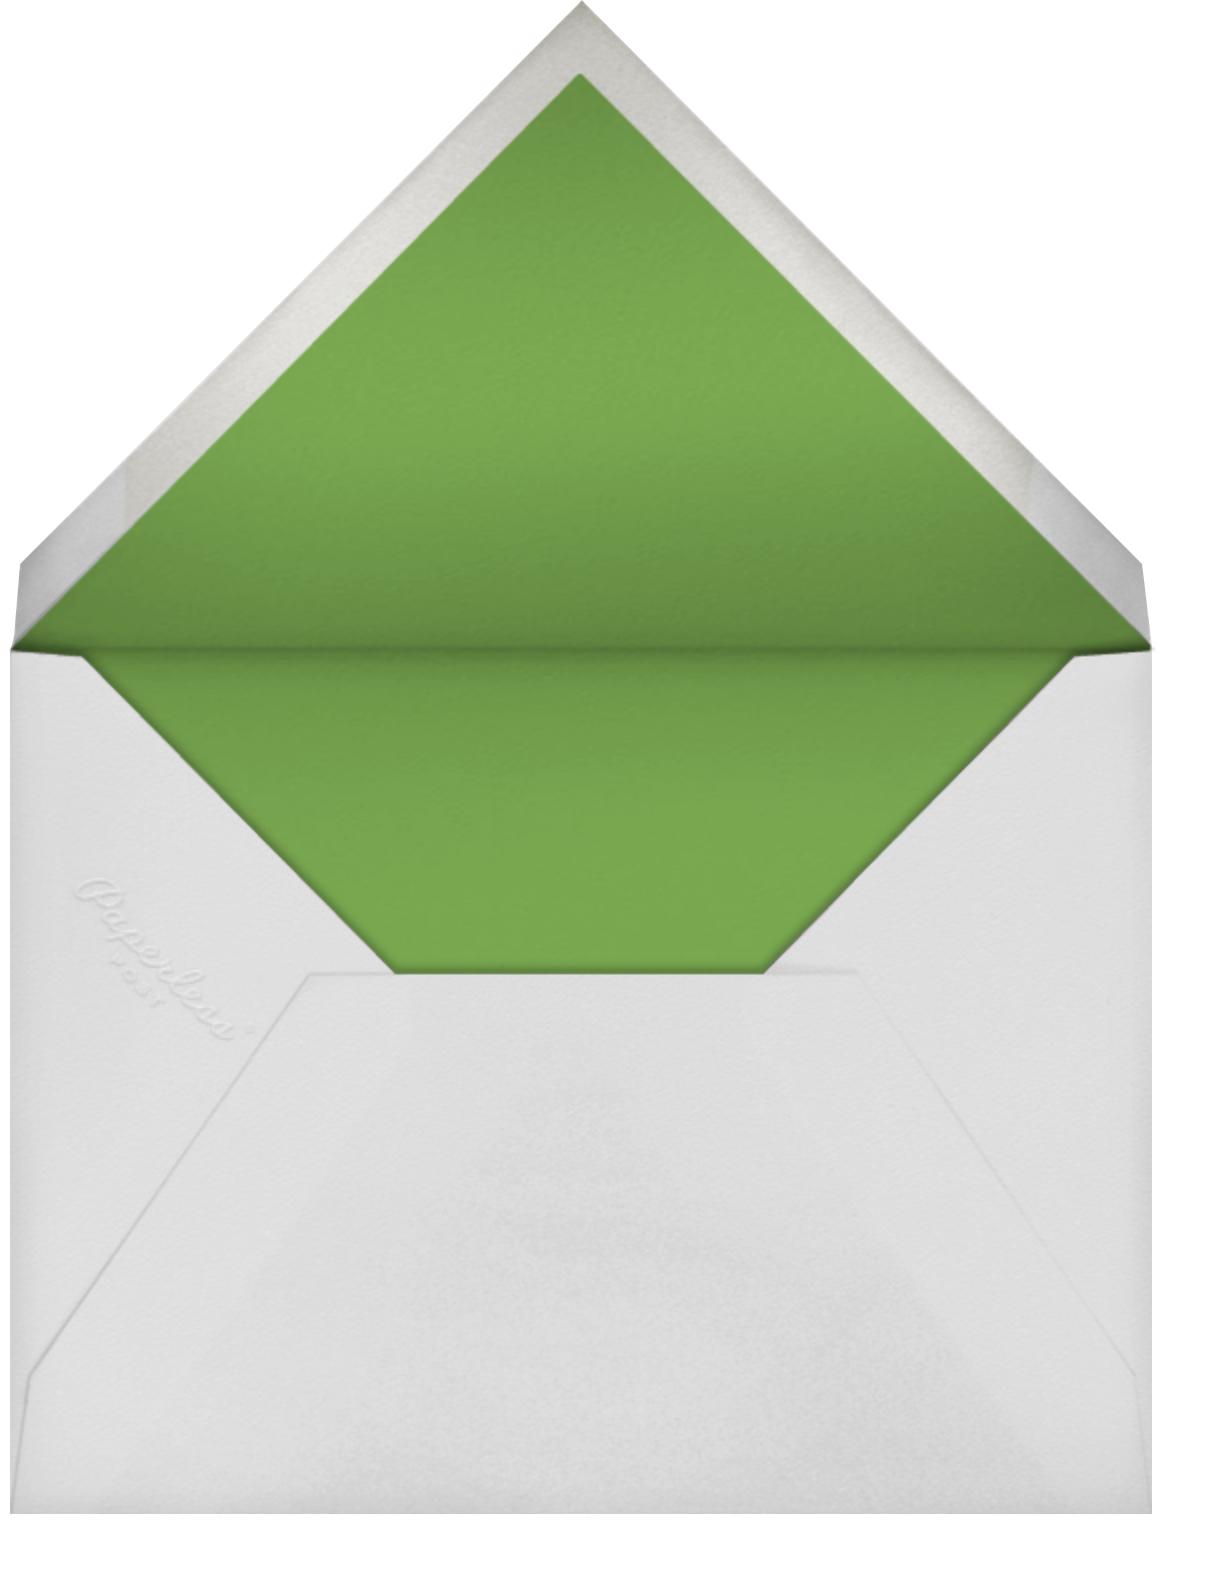 La Pavillion II (Photo Save the Date) - Green - kate spade new york - Envelope